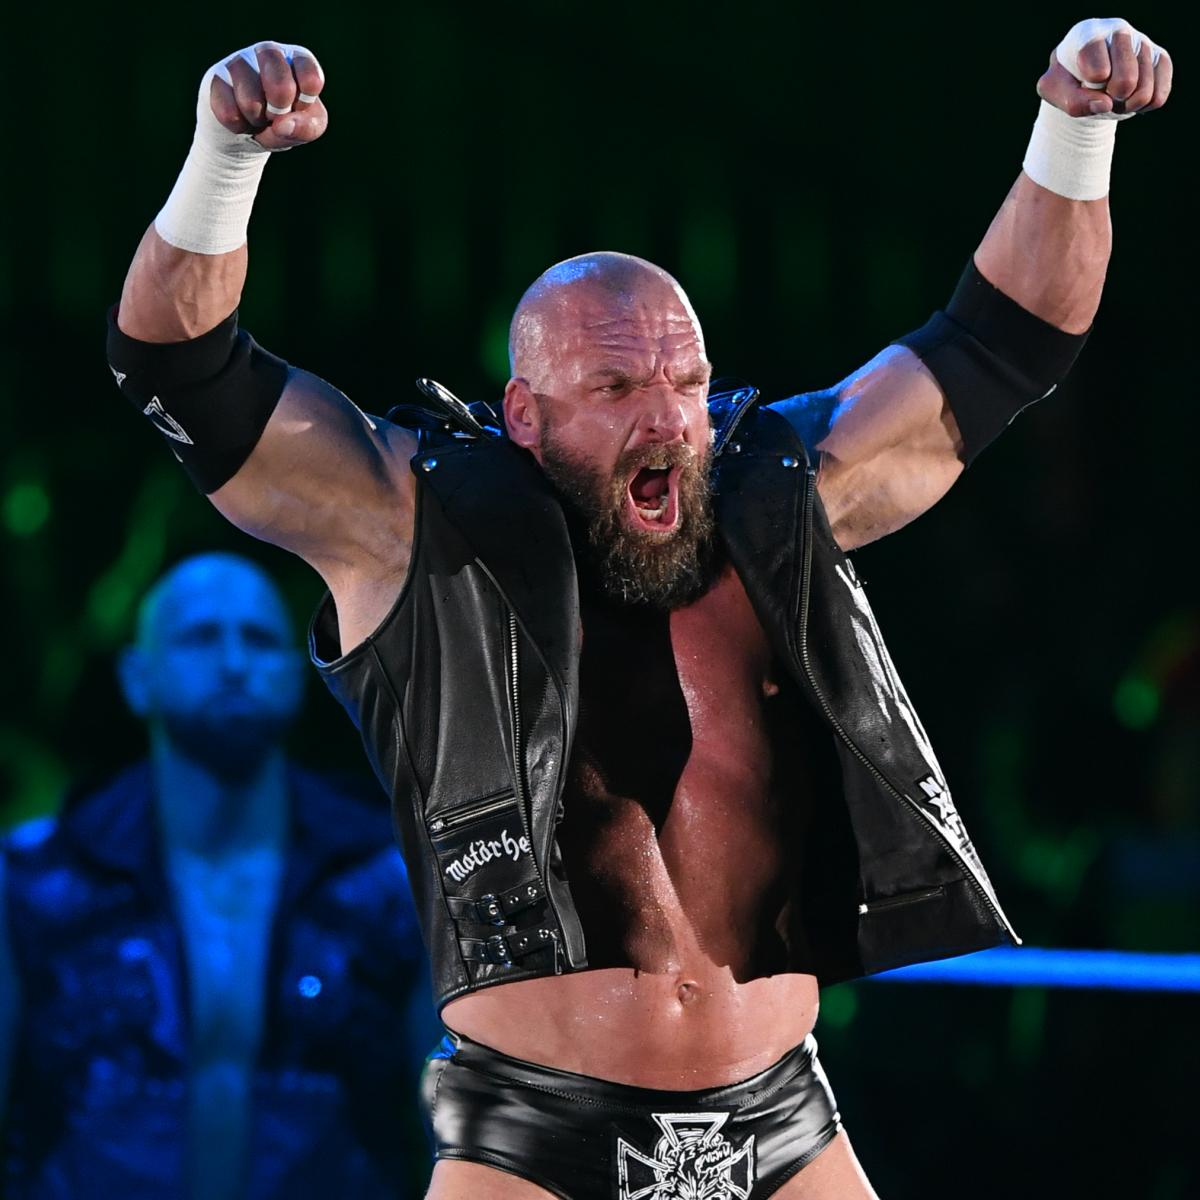 Triple H WrestleMania Rumor, WWE Japan Performance Center, Jon Moxley Interview